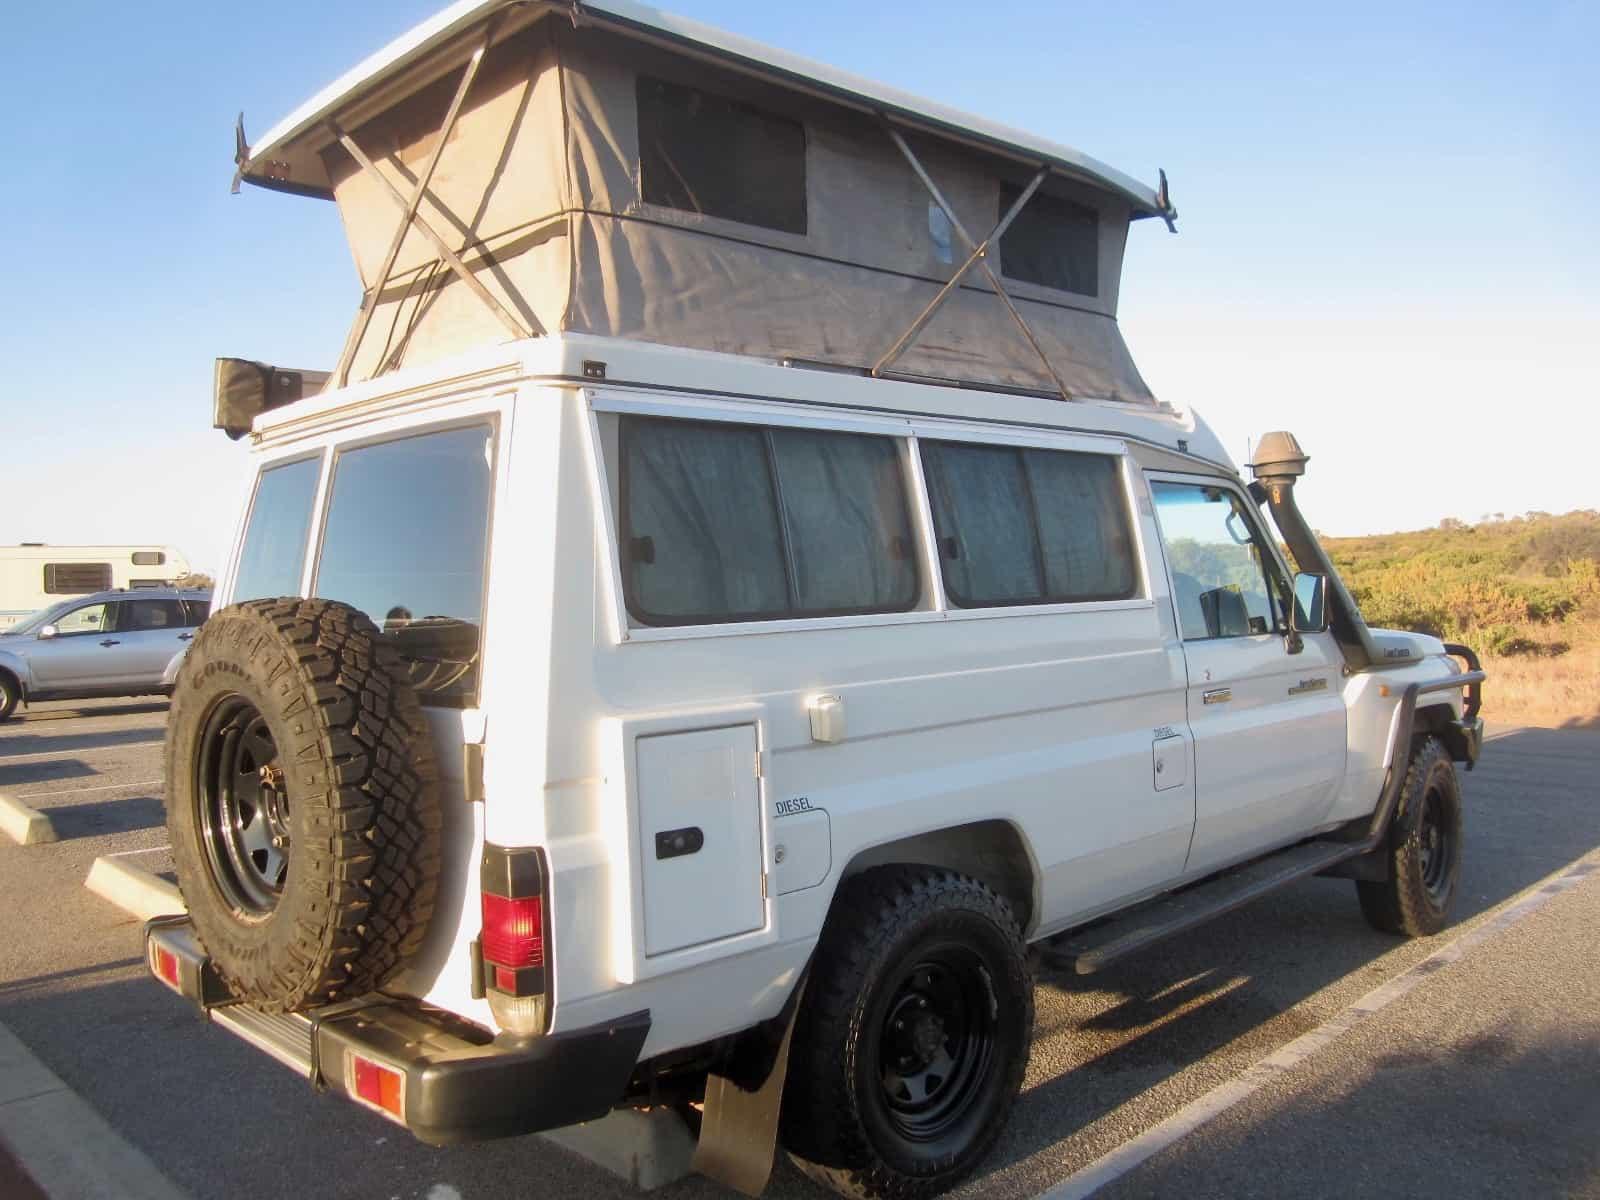 Bonito Toyota Landcruiser Bushcamper